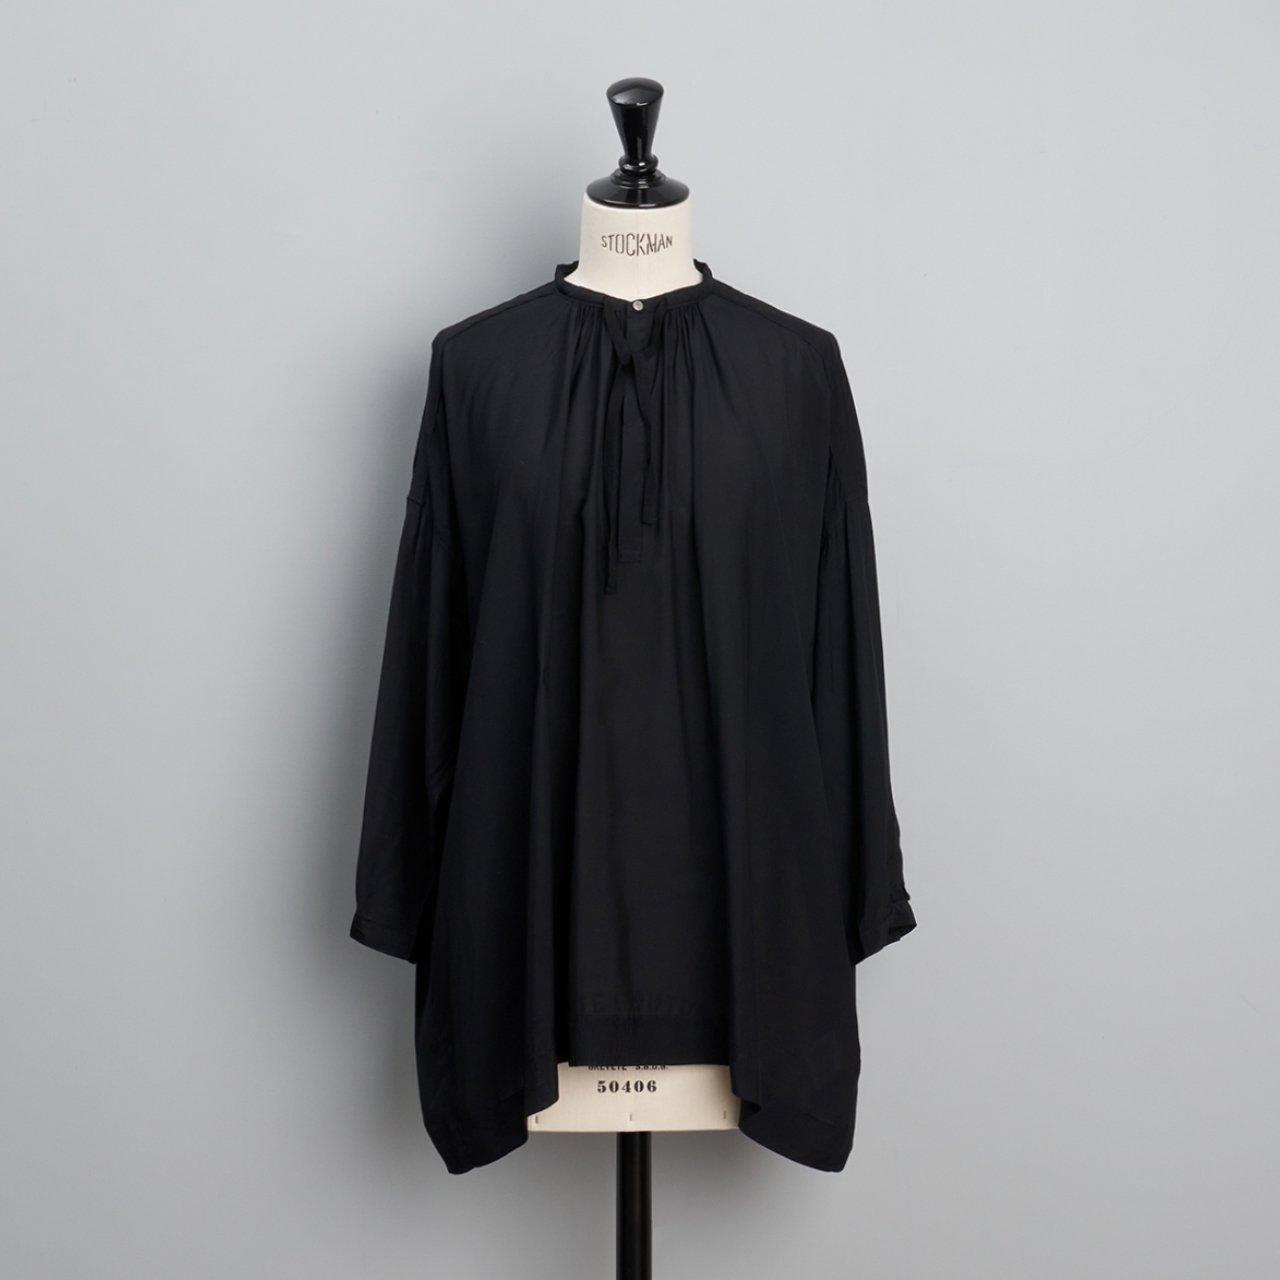 suzuki takayuki<BR>slip-on blouse<BR>black